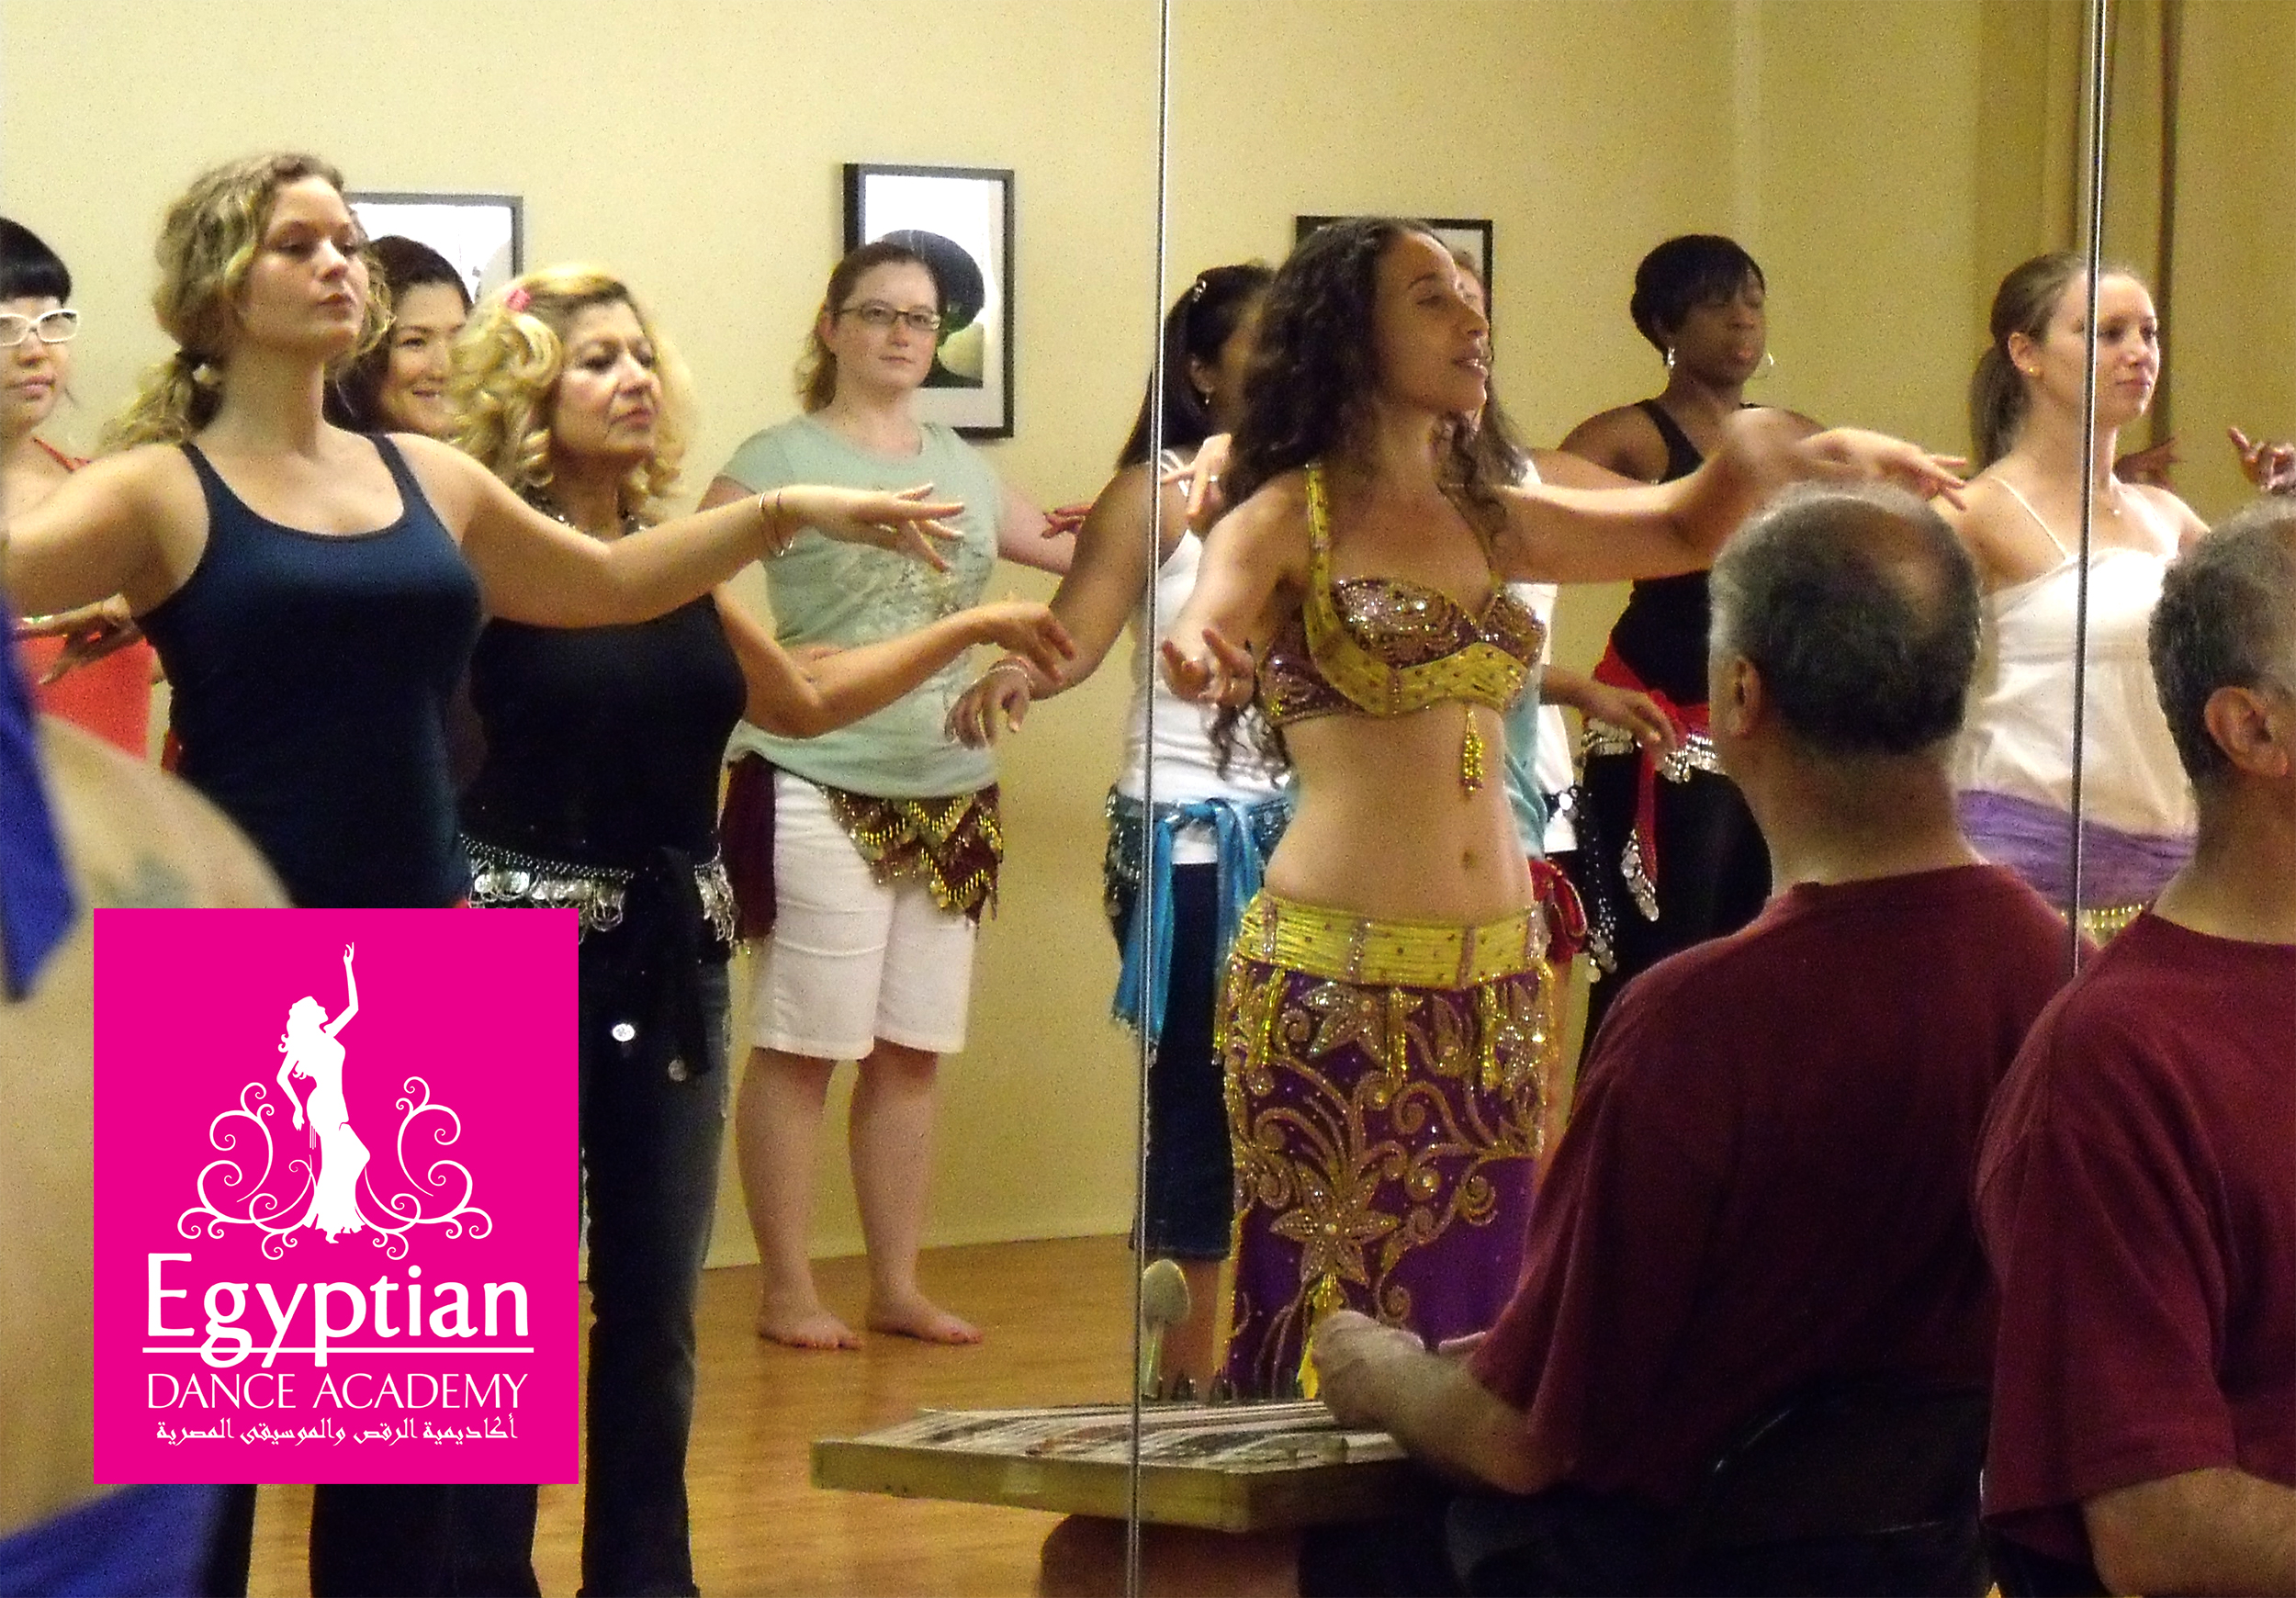 Egyptian Dance Academy Classes